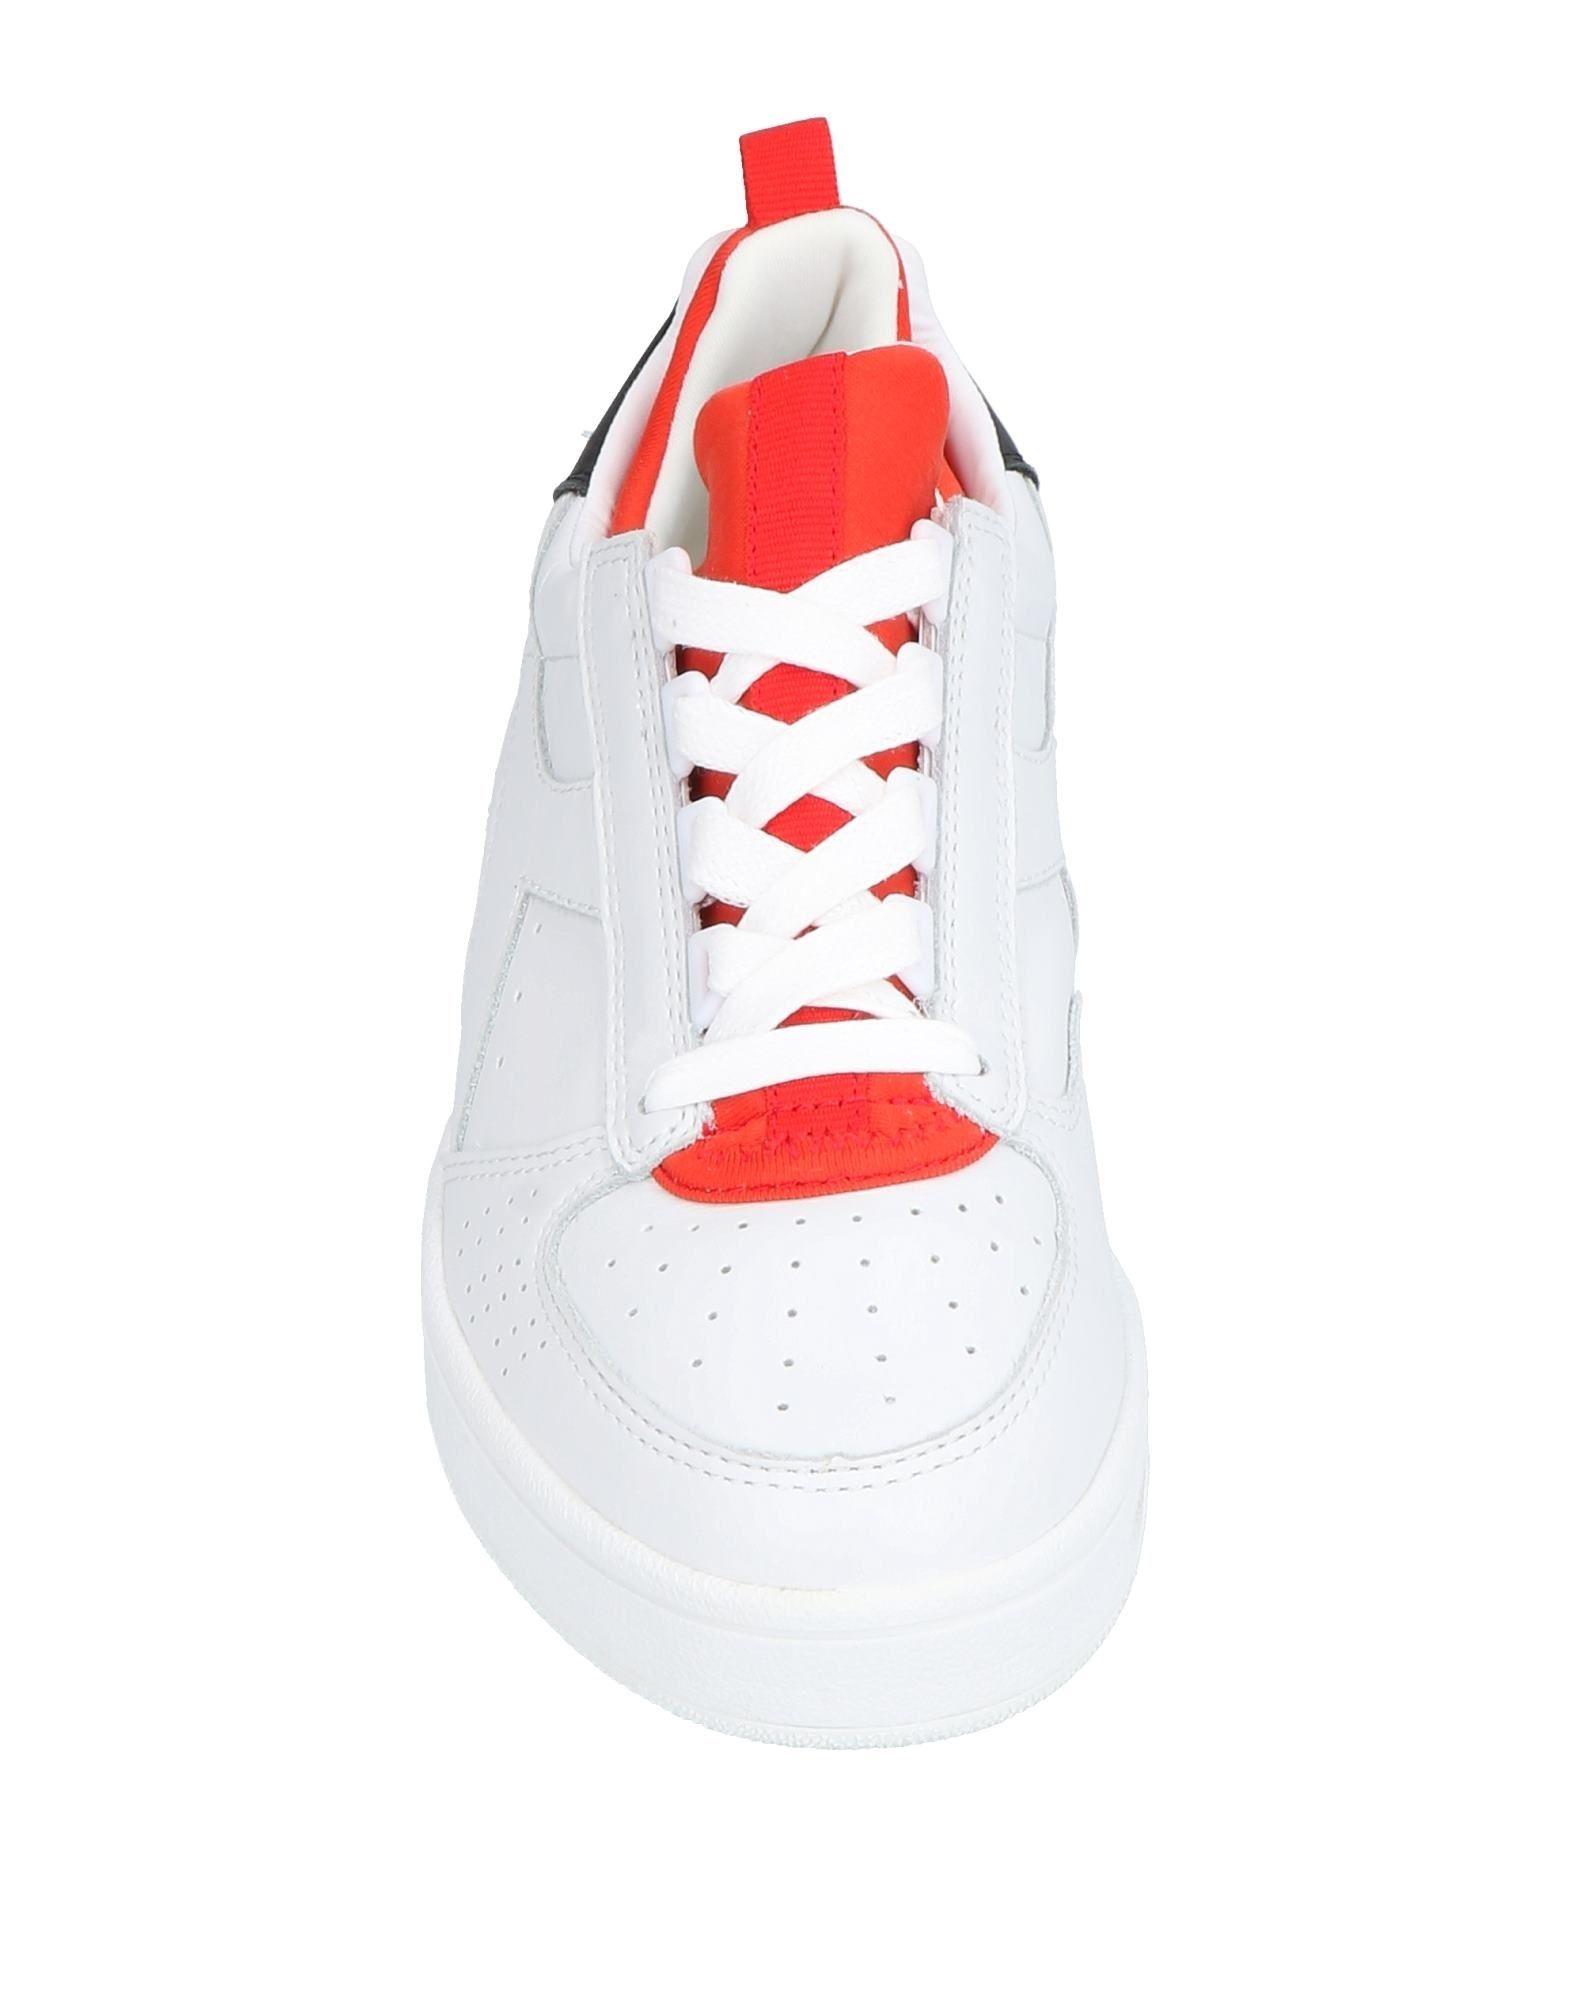 Diadora Heritage Sneakers Damen beliebte  11485655AD Gute Qualität beliebte Damen Schuhe 6495c4